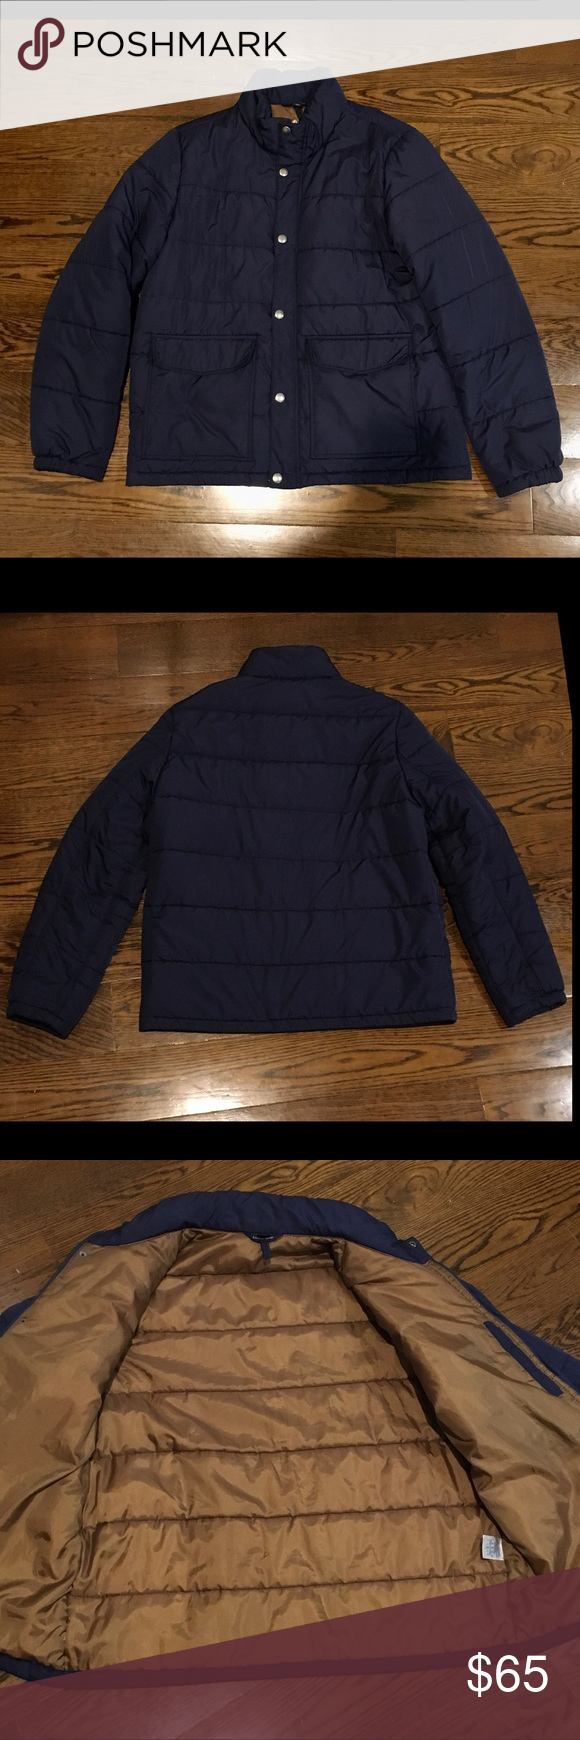 Landsend Men S Navy Quilted Puffer Jacket Large Lands End Men S Quilted Puffer Jacket Size Large 42 44 Colo Quilted Puffer Jacket Quilted Parka Parka Jacket [ 1740 x 580 Pixel ]